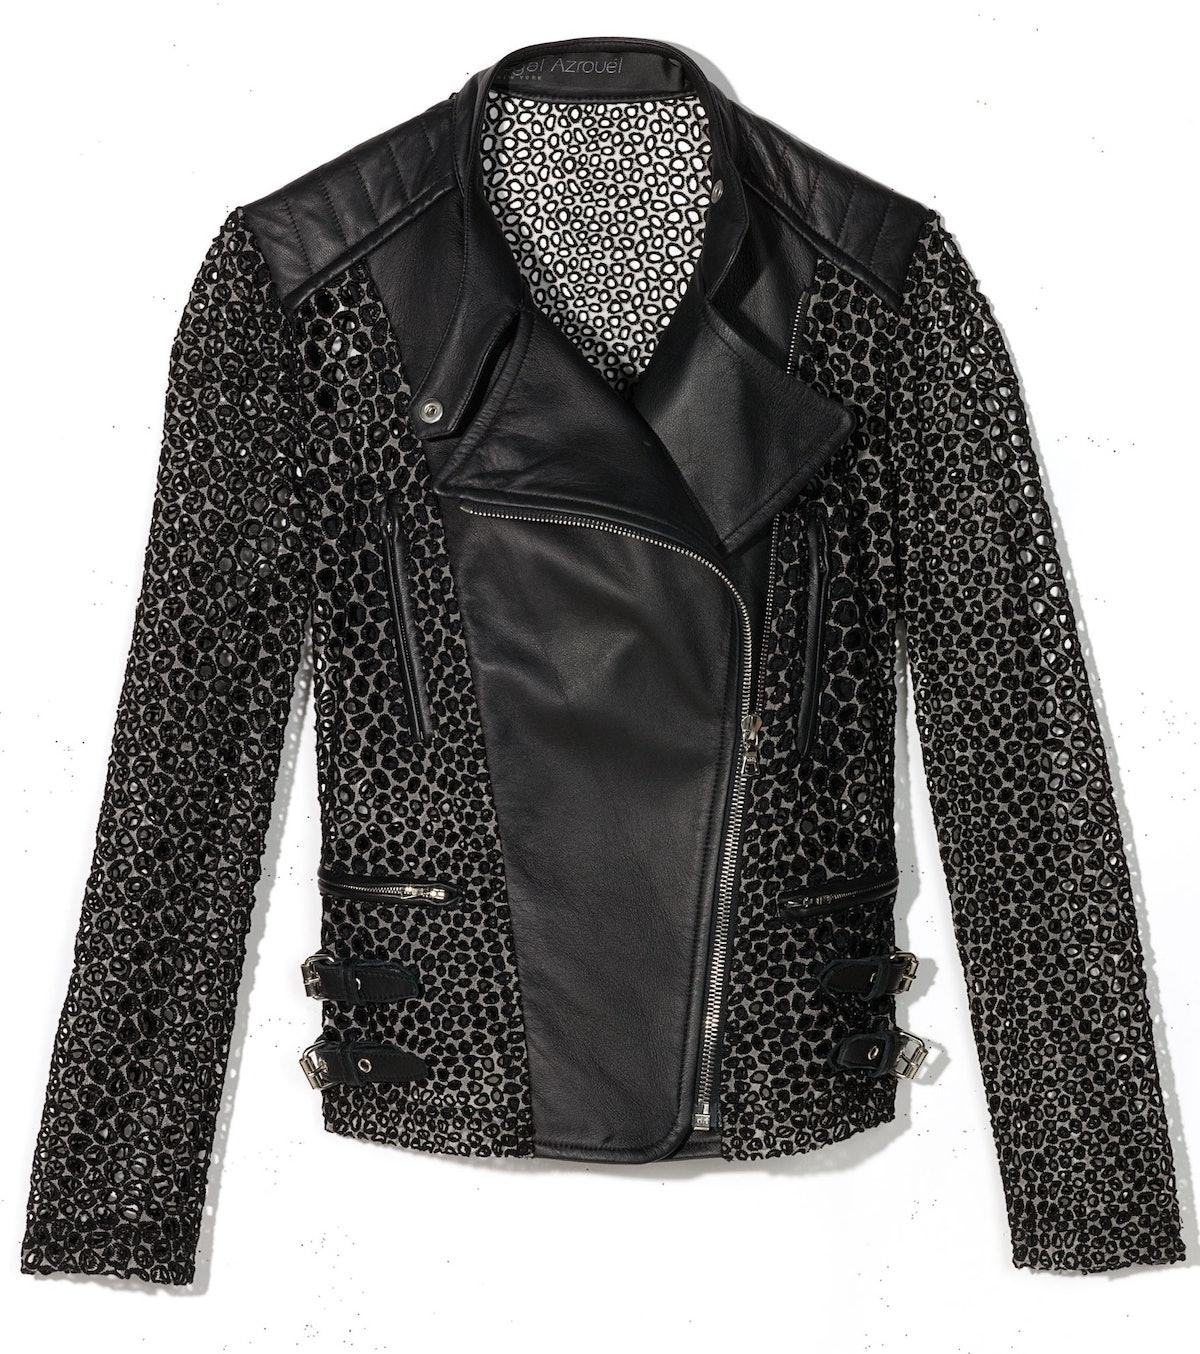 Yigal Azrouel jacket, $1,490, [nordstrom.com](http://rstyle.me/n/efdd43w3n).